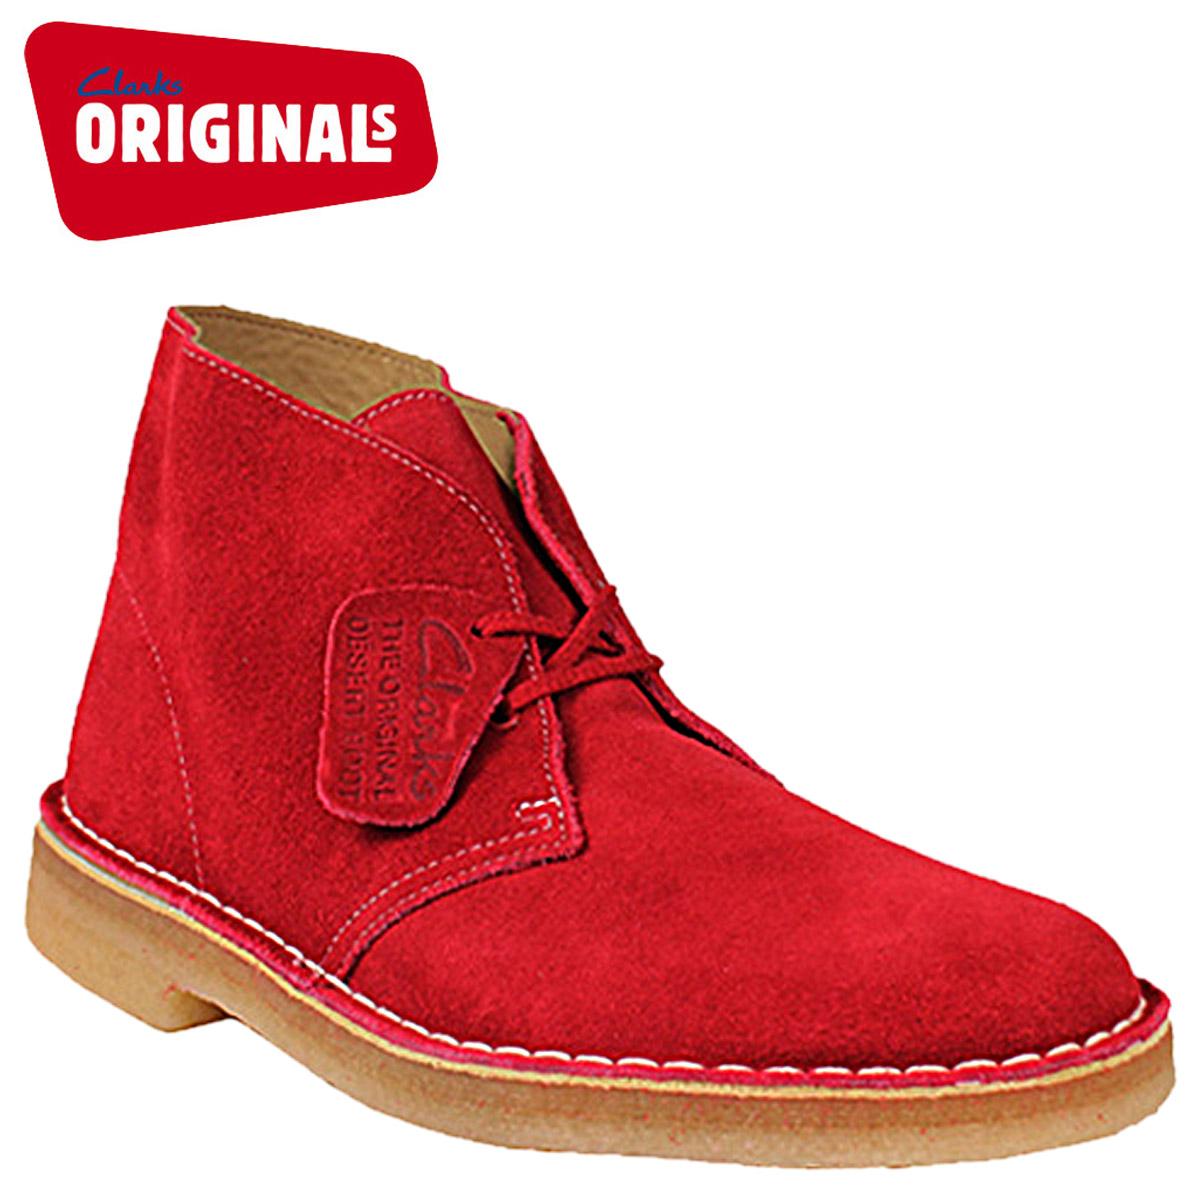 Discount Shoes Boots Online